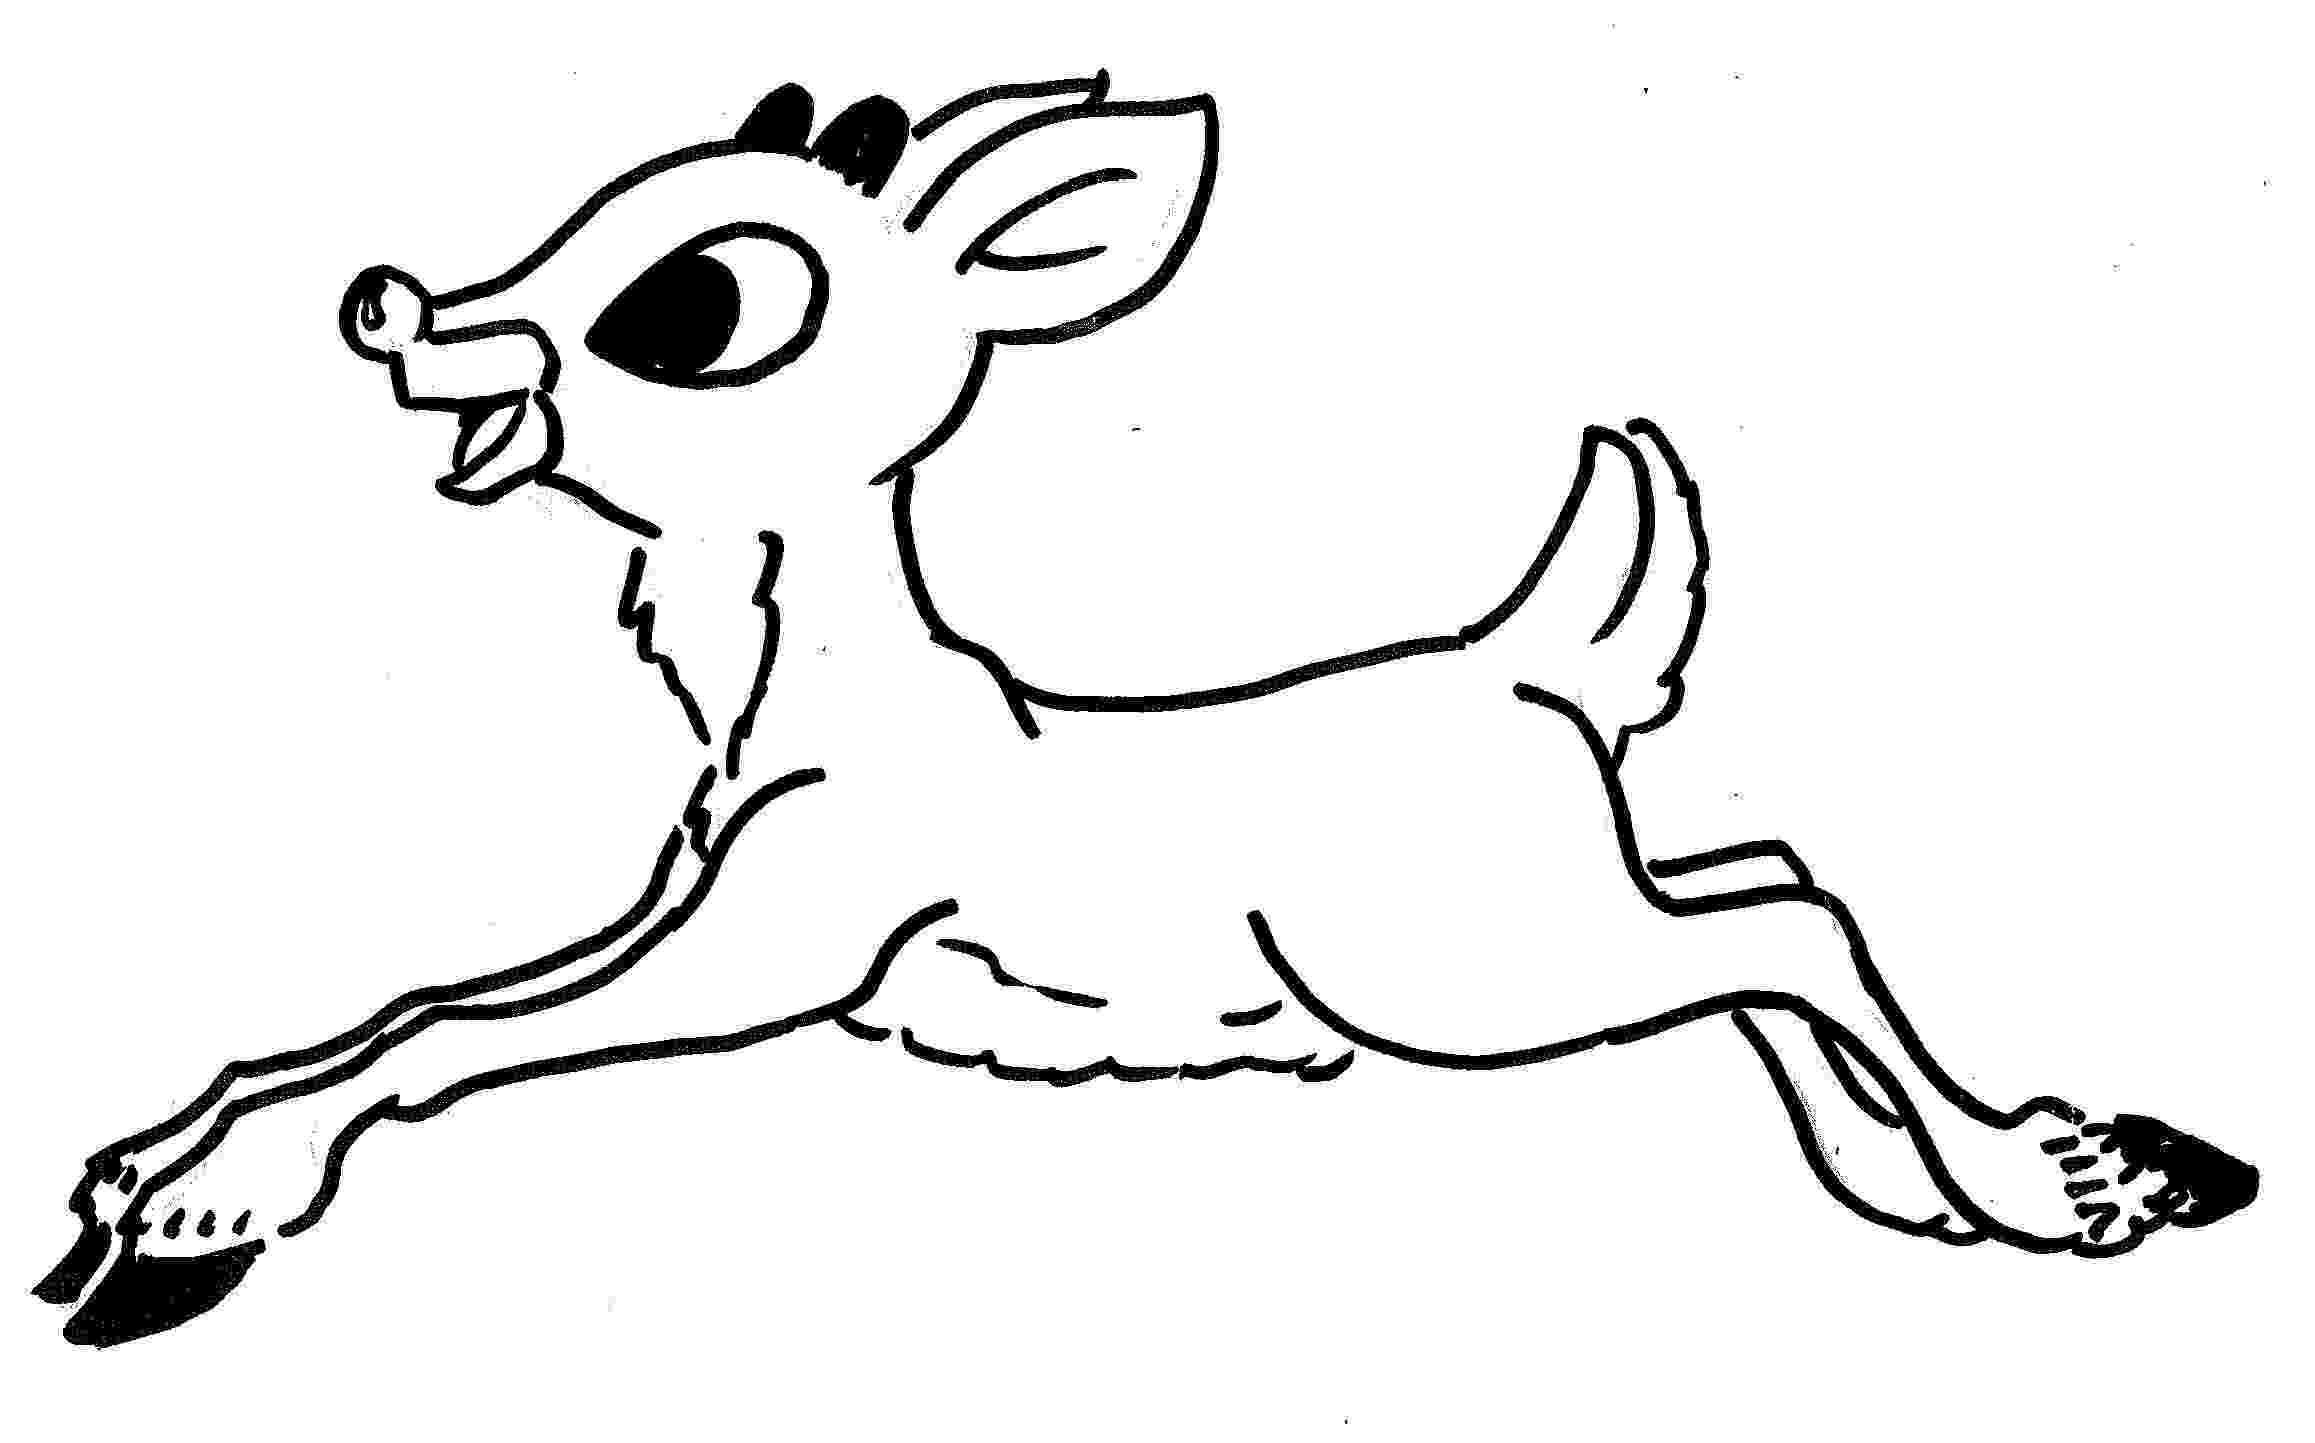 raindeer sketch reindeer games line art by viergacht on deviantart sketch raindeer